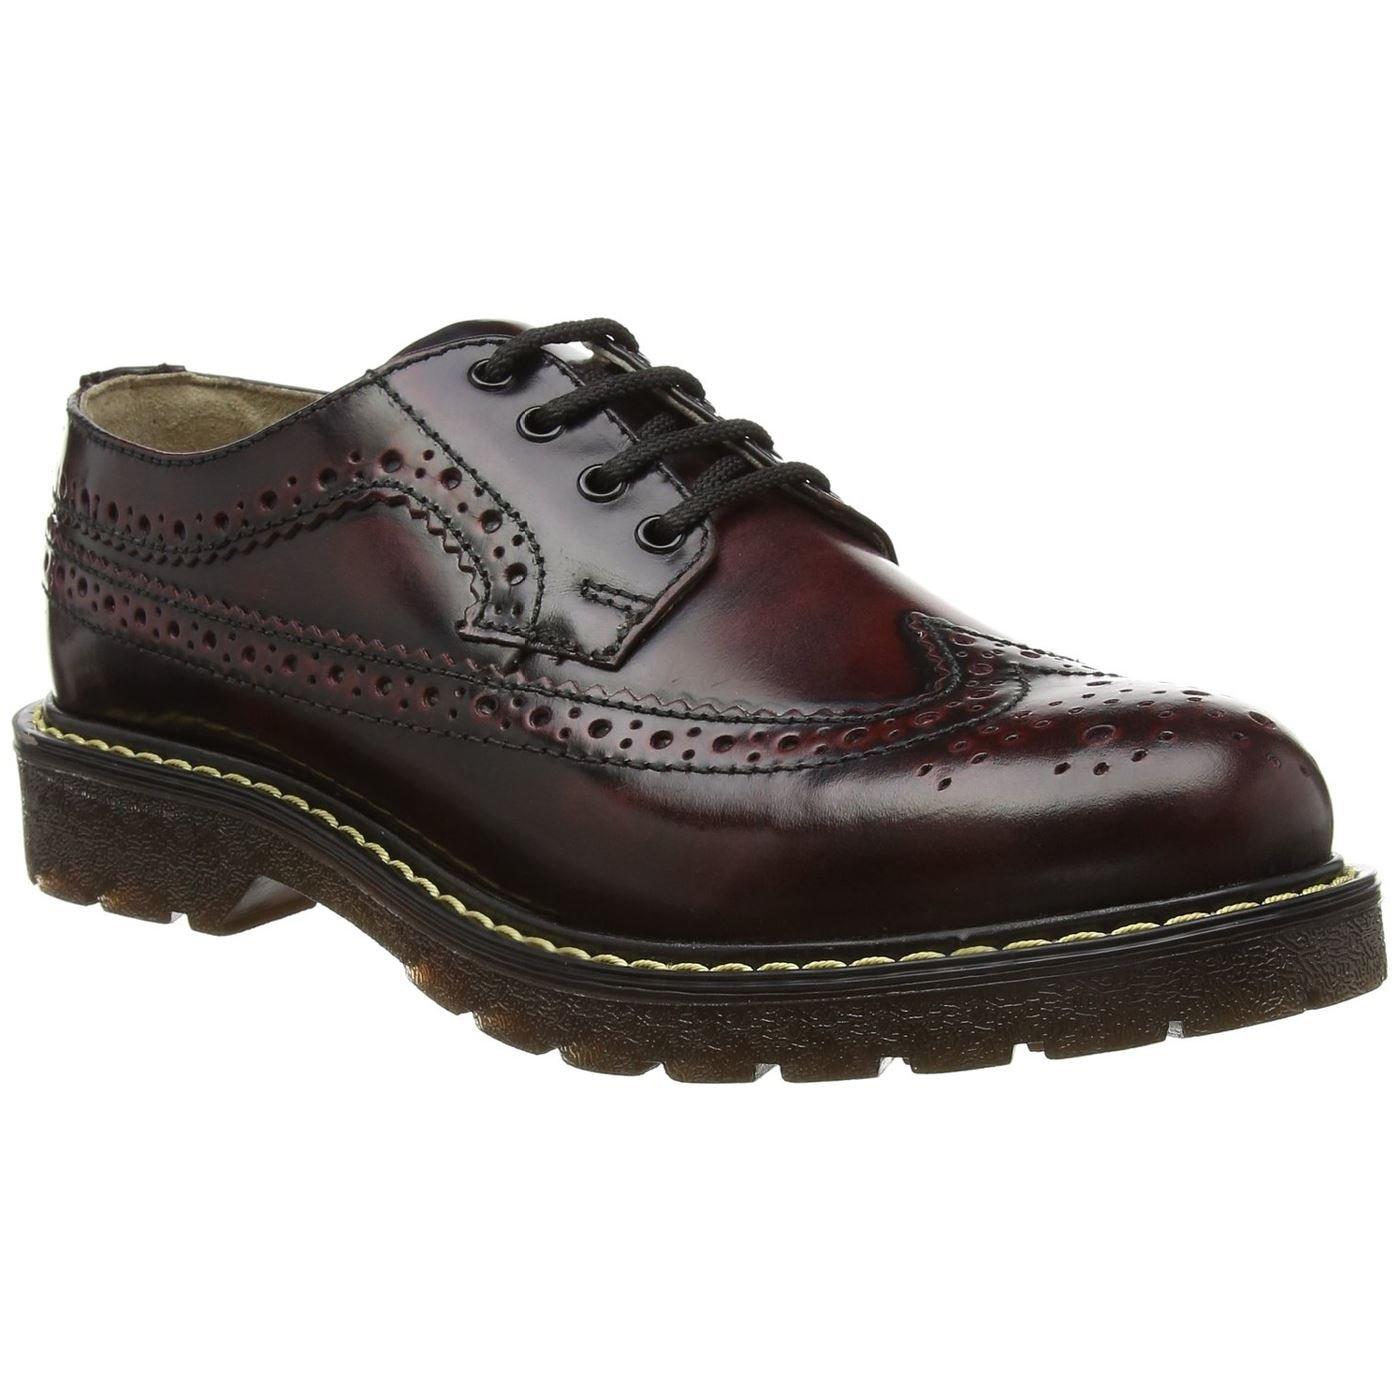 TALLA 41 EU. Grinders Bertrum, Zapatos de Cordones Brogue para Hombre